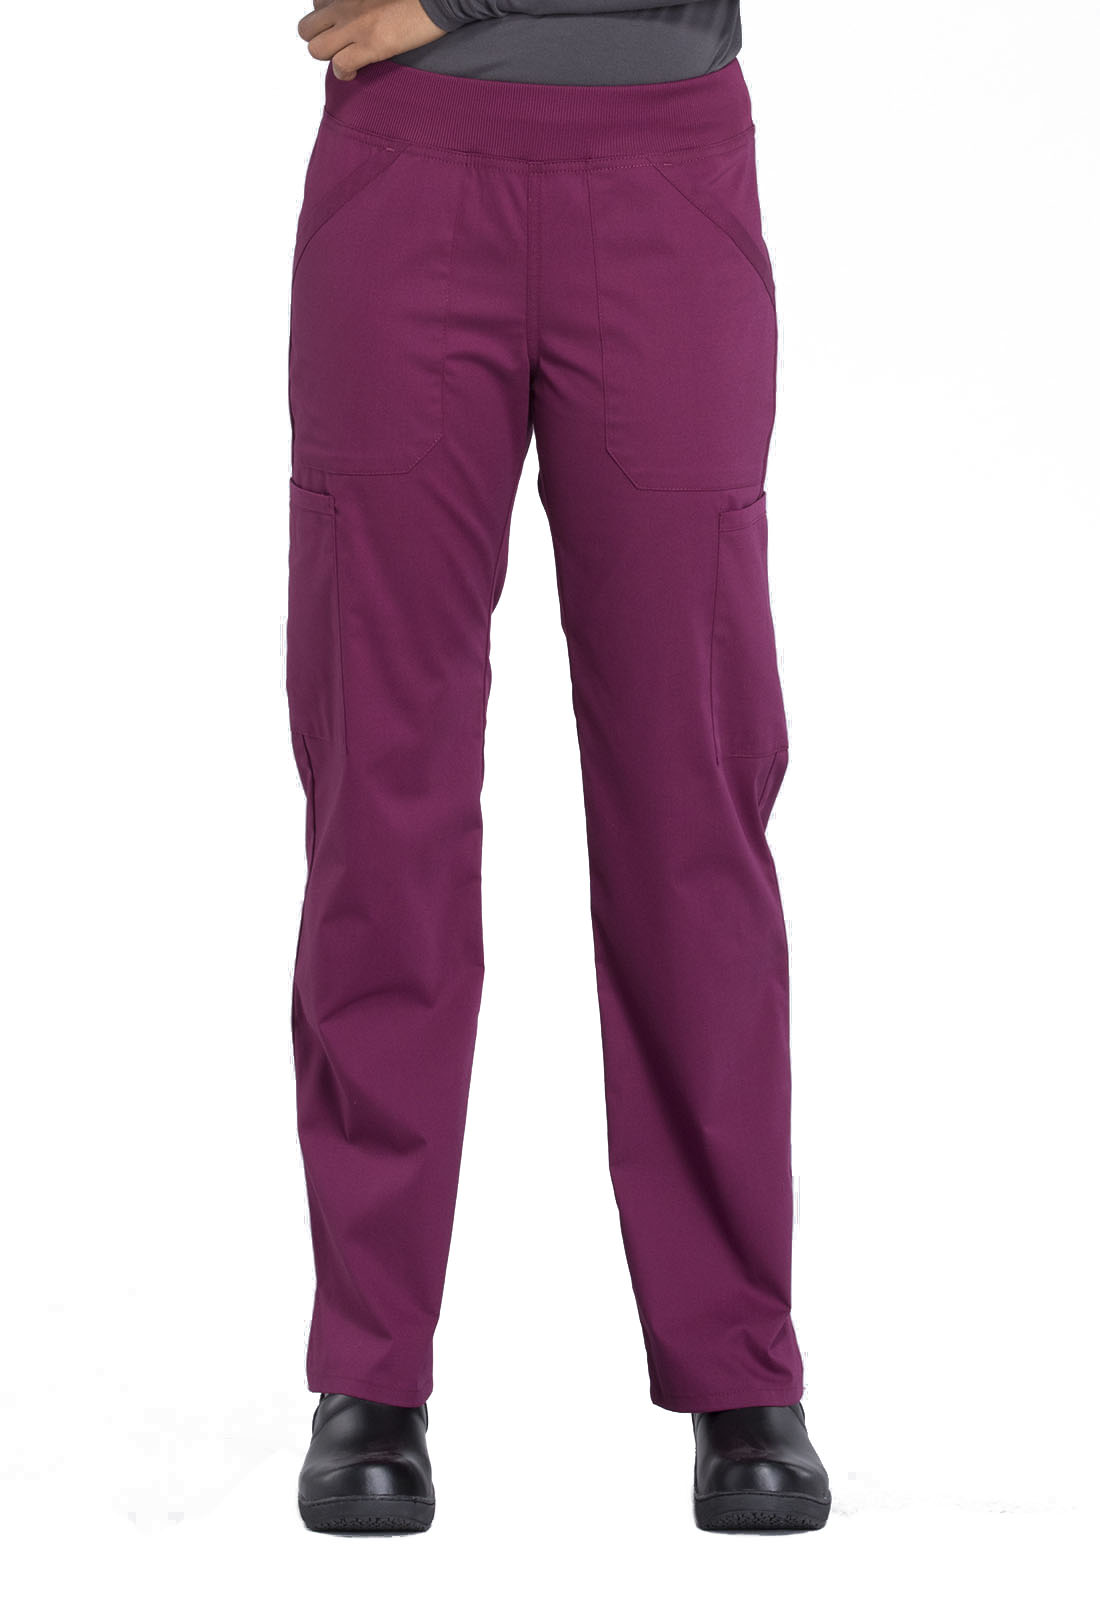 "Wine Cherokee Scrubs Workwear Professionals 30/"" Knit Waistband Skirt WW510 WIN"